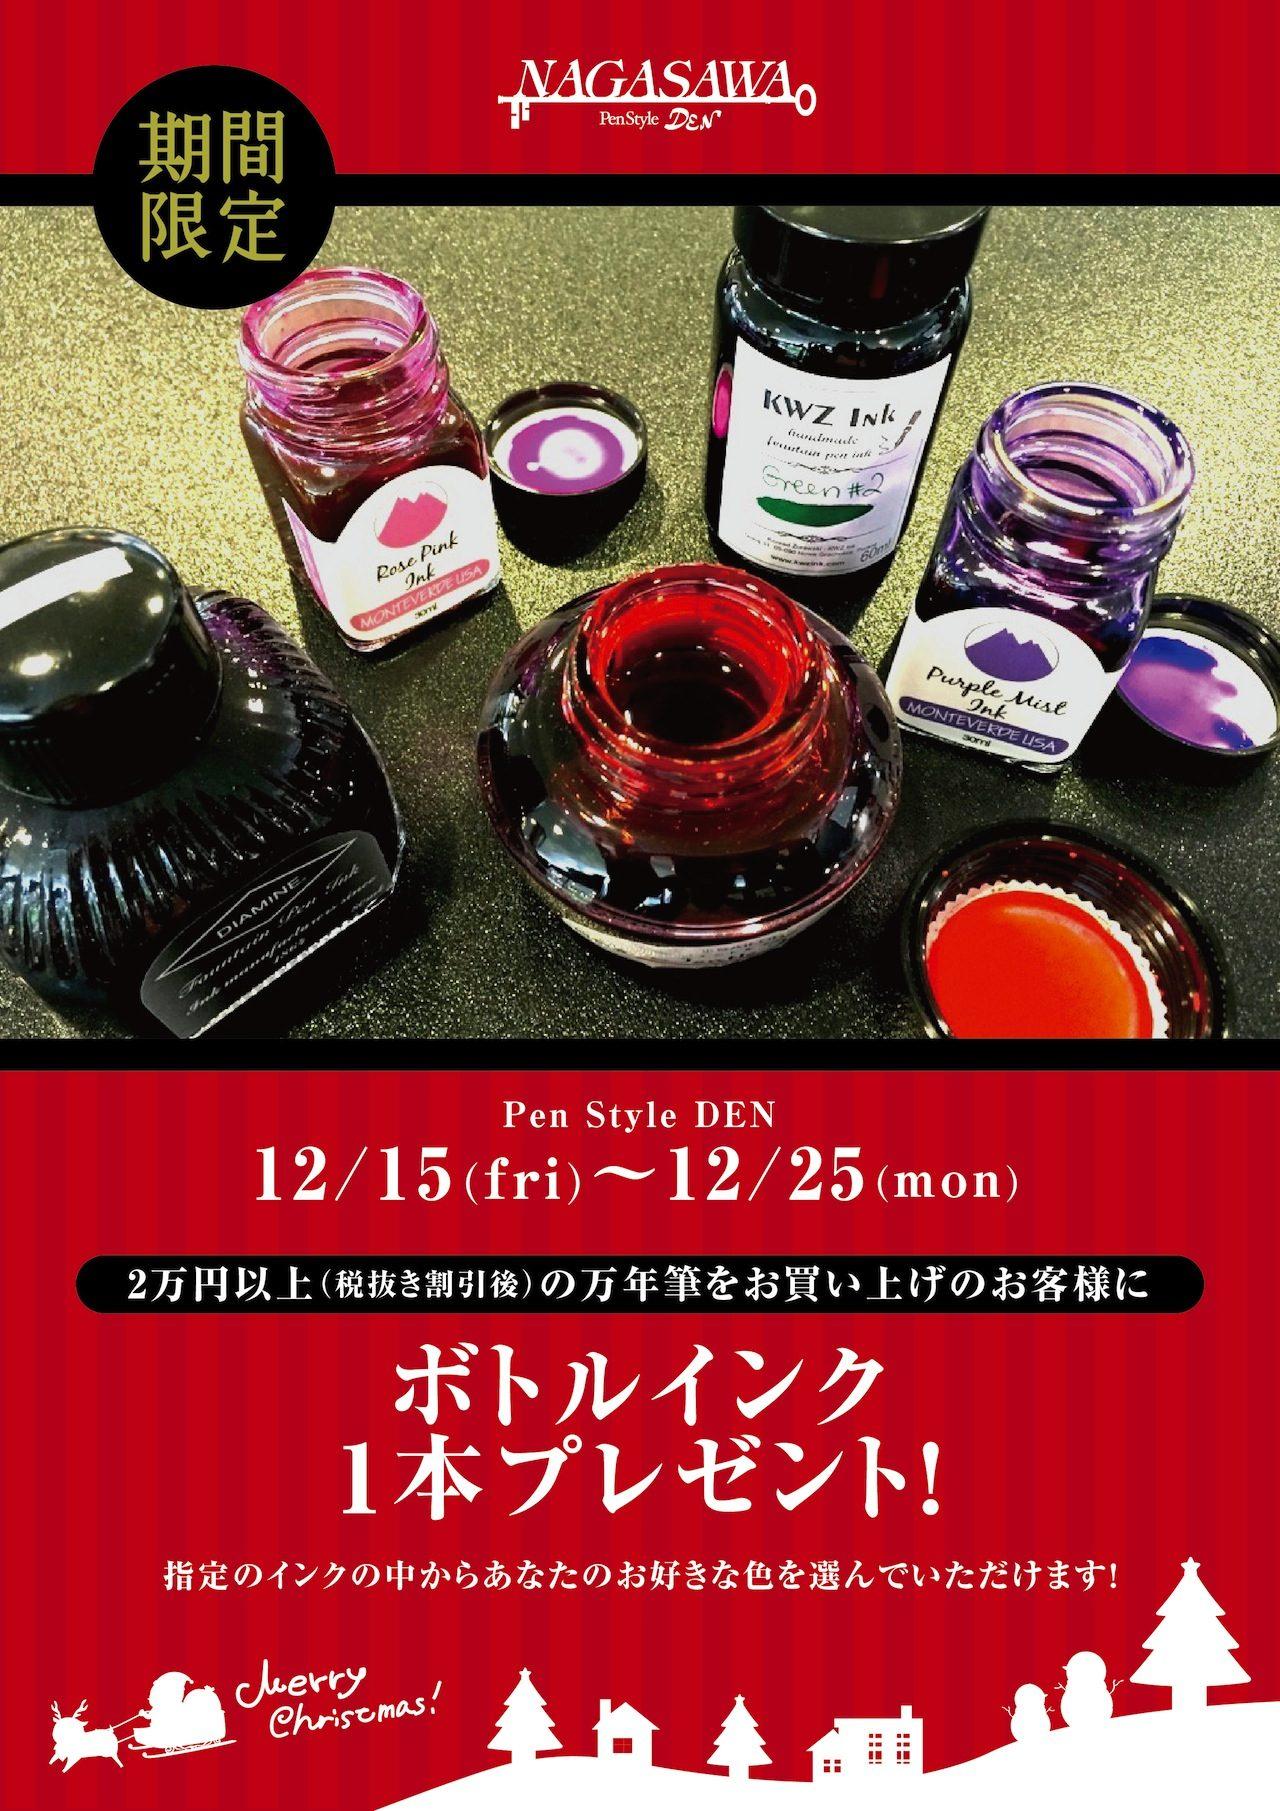 NAGASAWA PenSTYLE DEN 限定企画|期間限定でボトルインクをプレゼント!